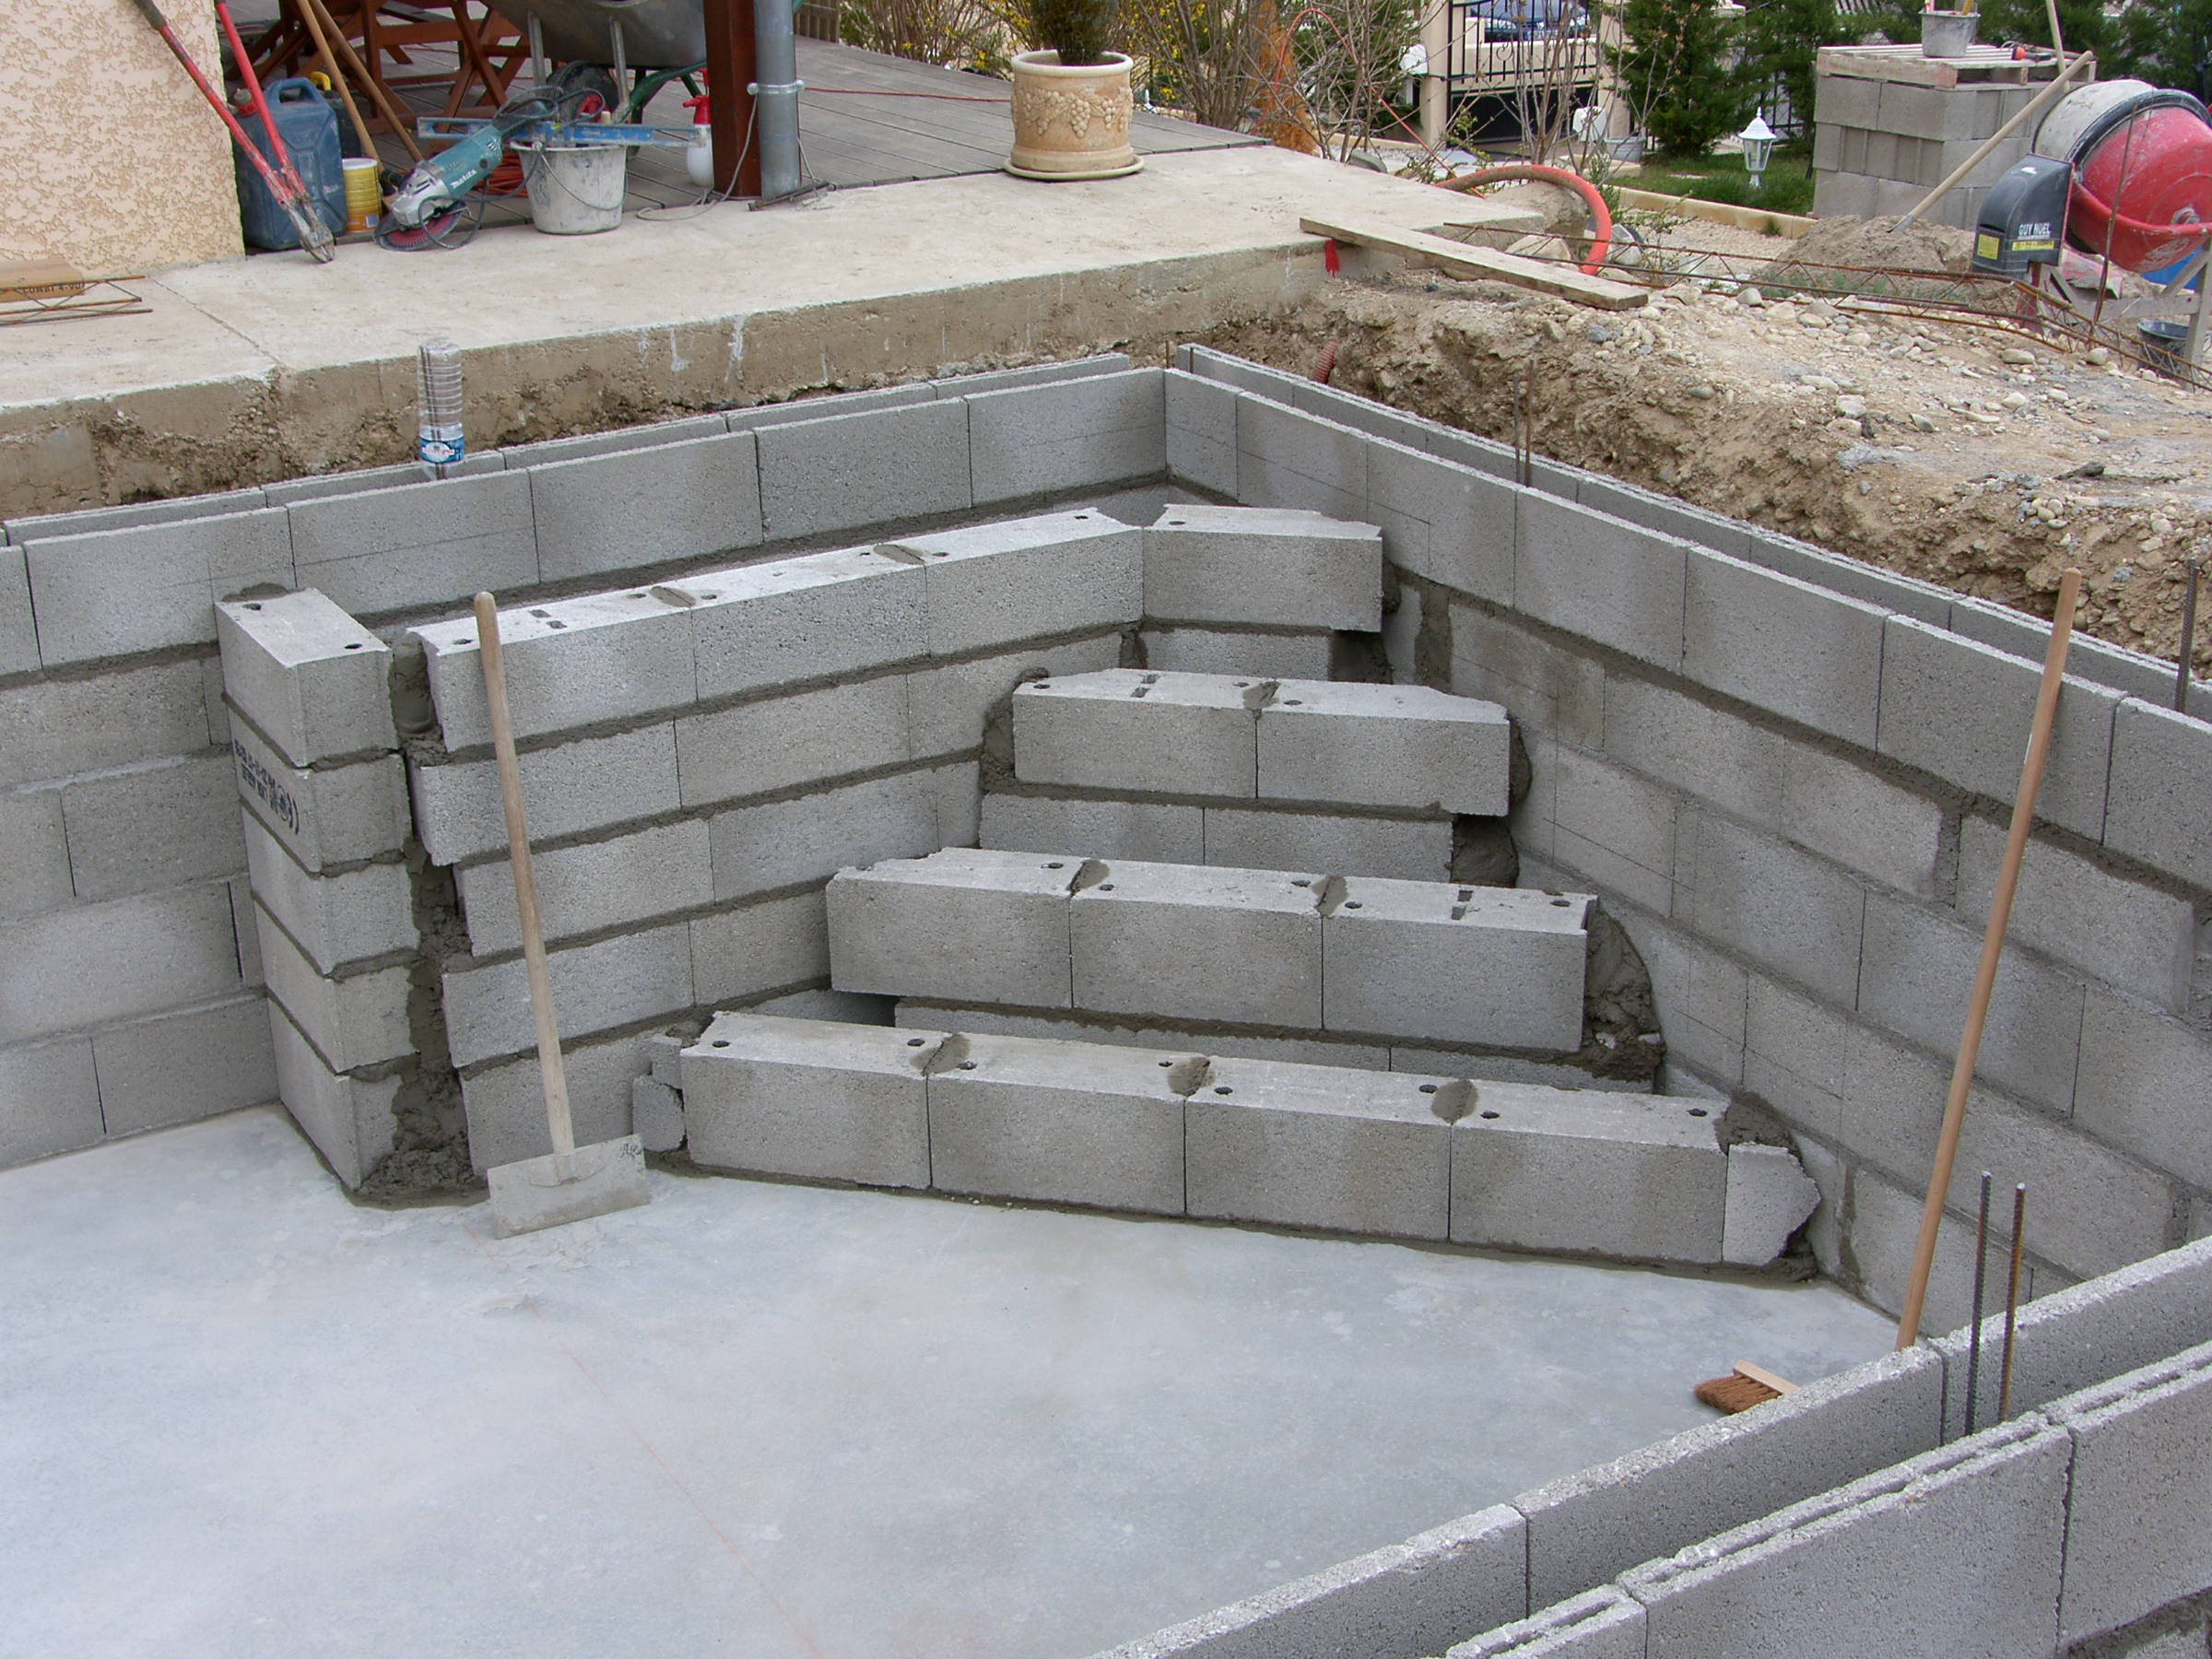 Ma piscine cr ation des escaliers for Escalier piscine